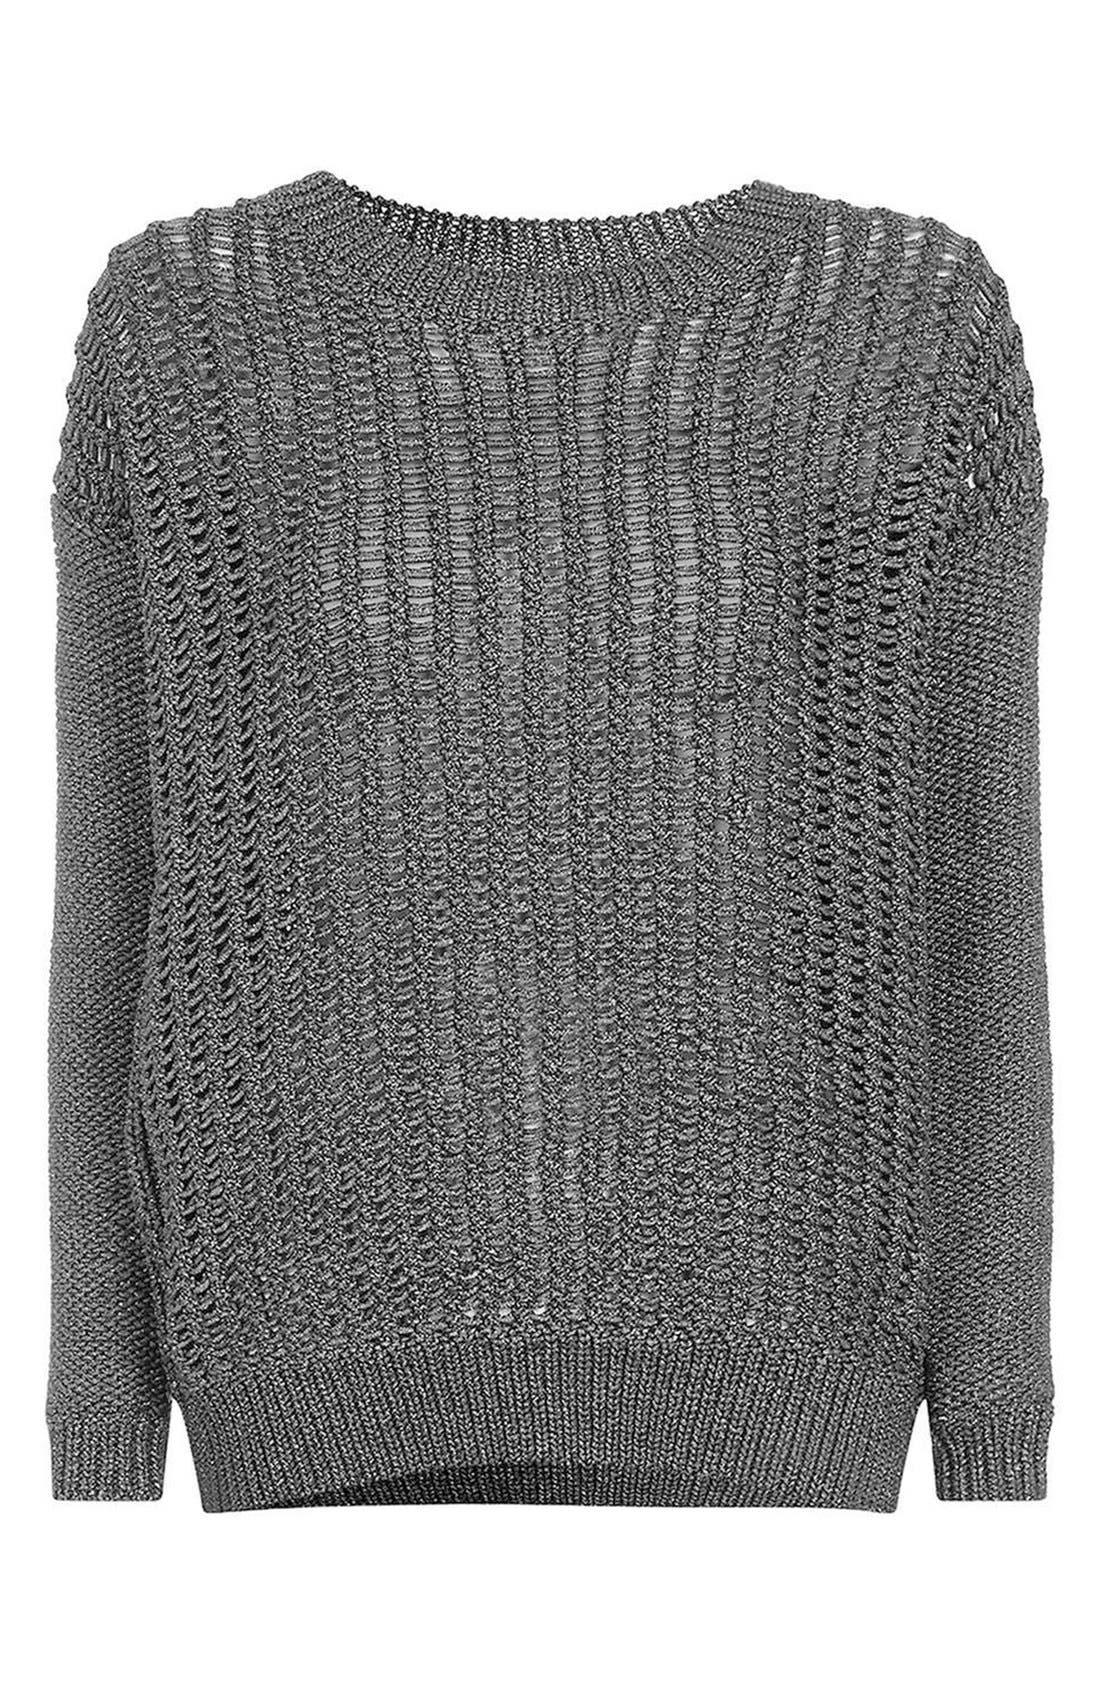 Alternate Image 1 Selected - Topshop Metallic Sweater